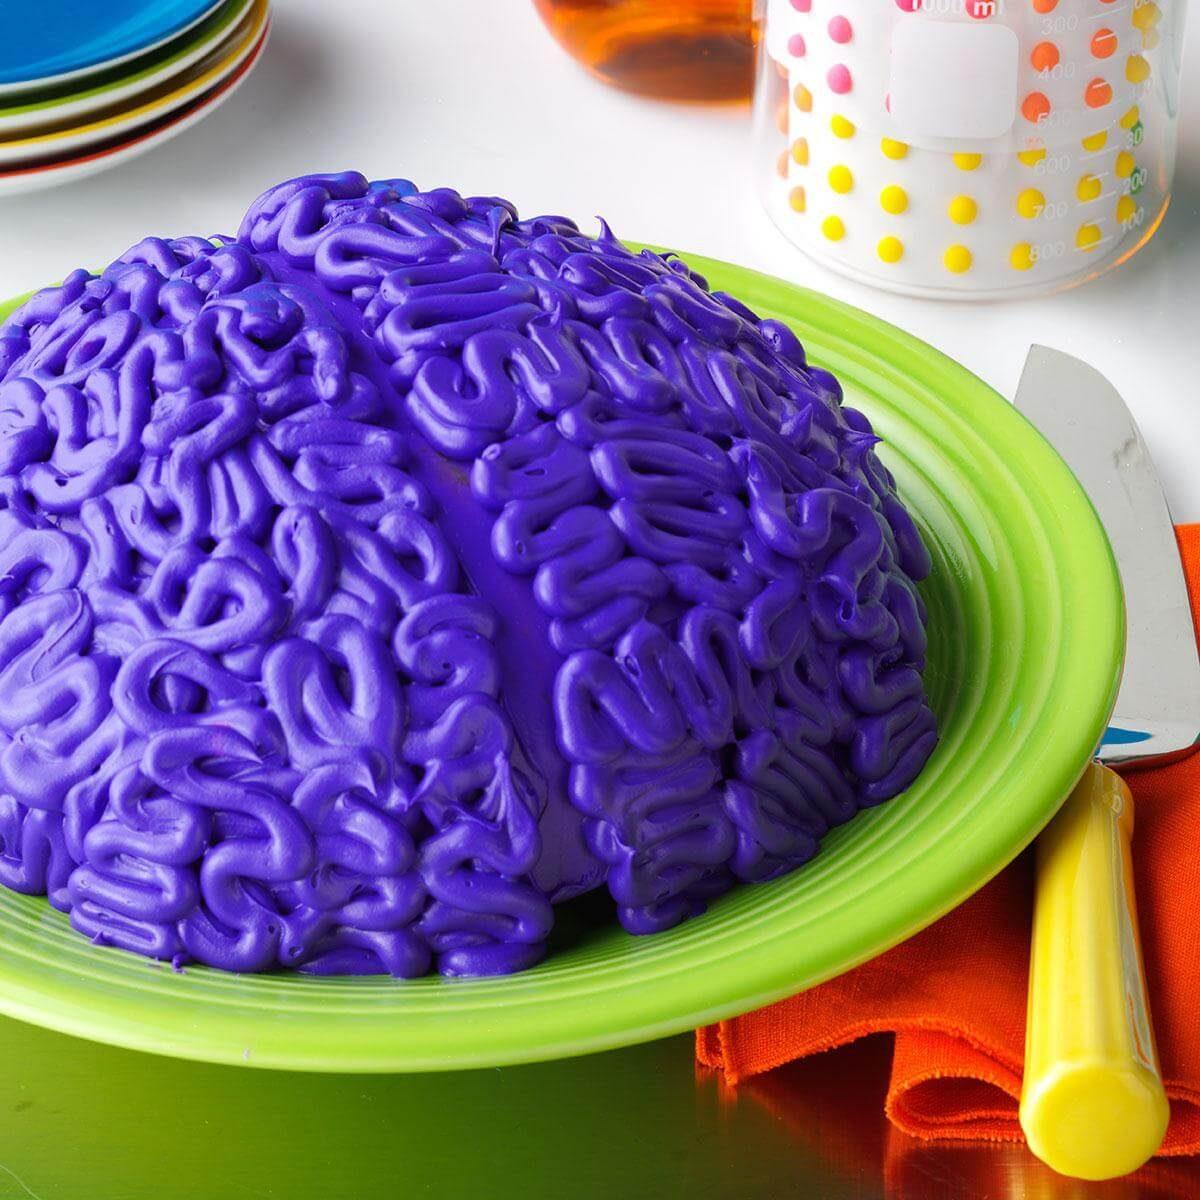 California: Brainy Cake